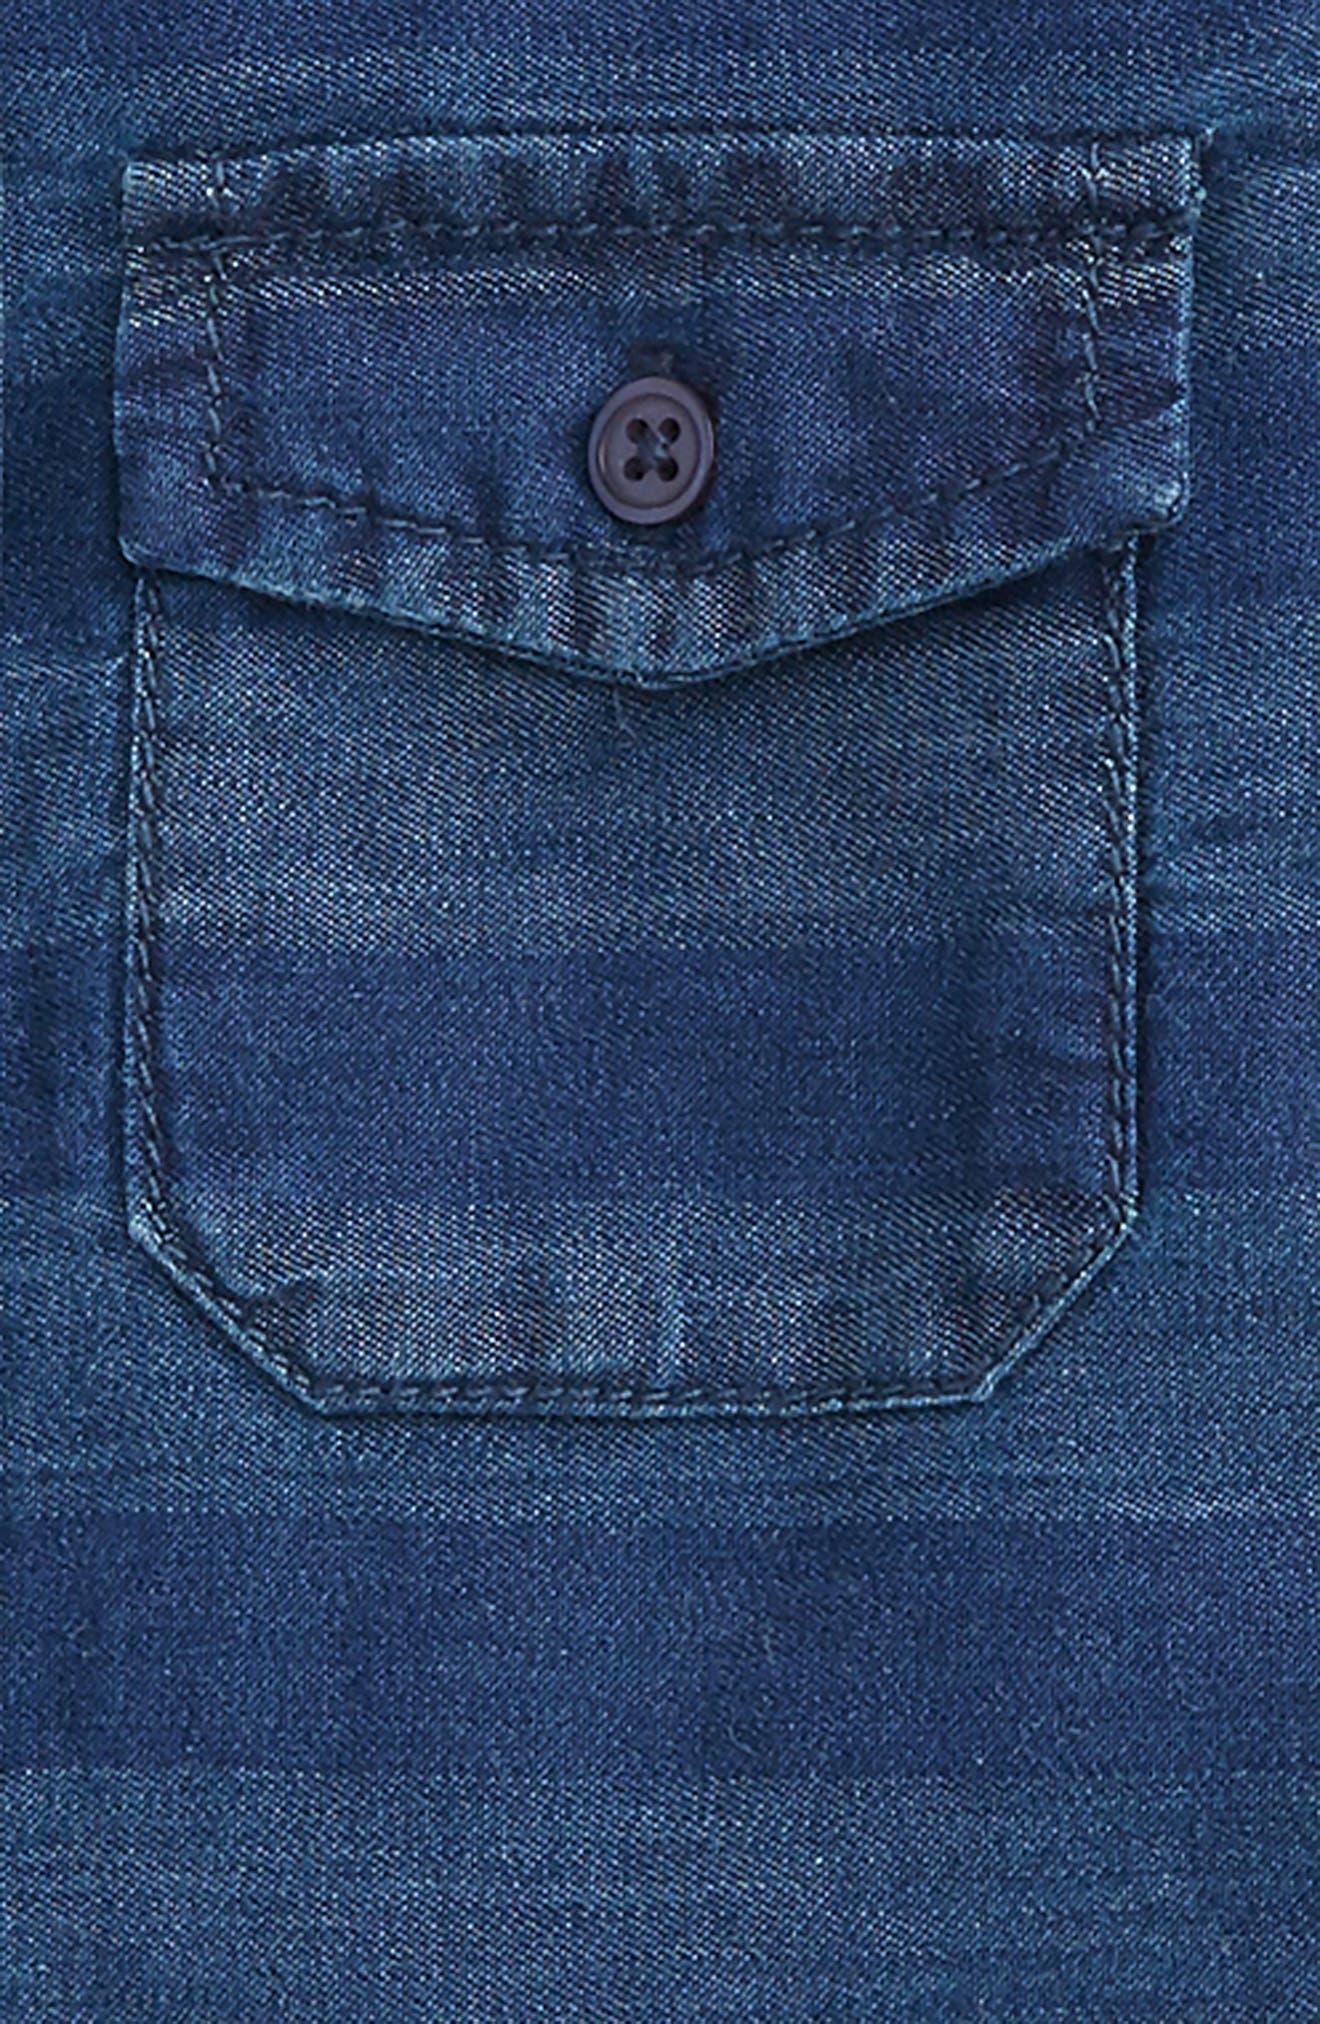 Alternate Image 2  - Peek Aiden Stripe Chambray Shirt (Baby Boys)